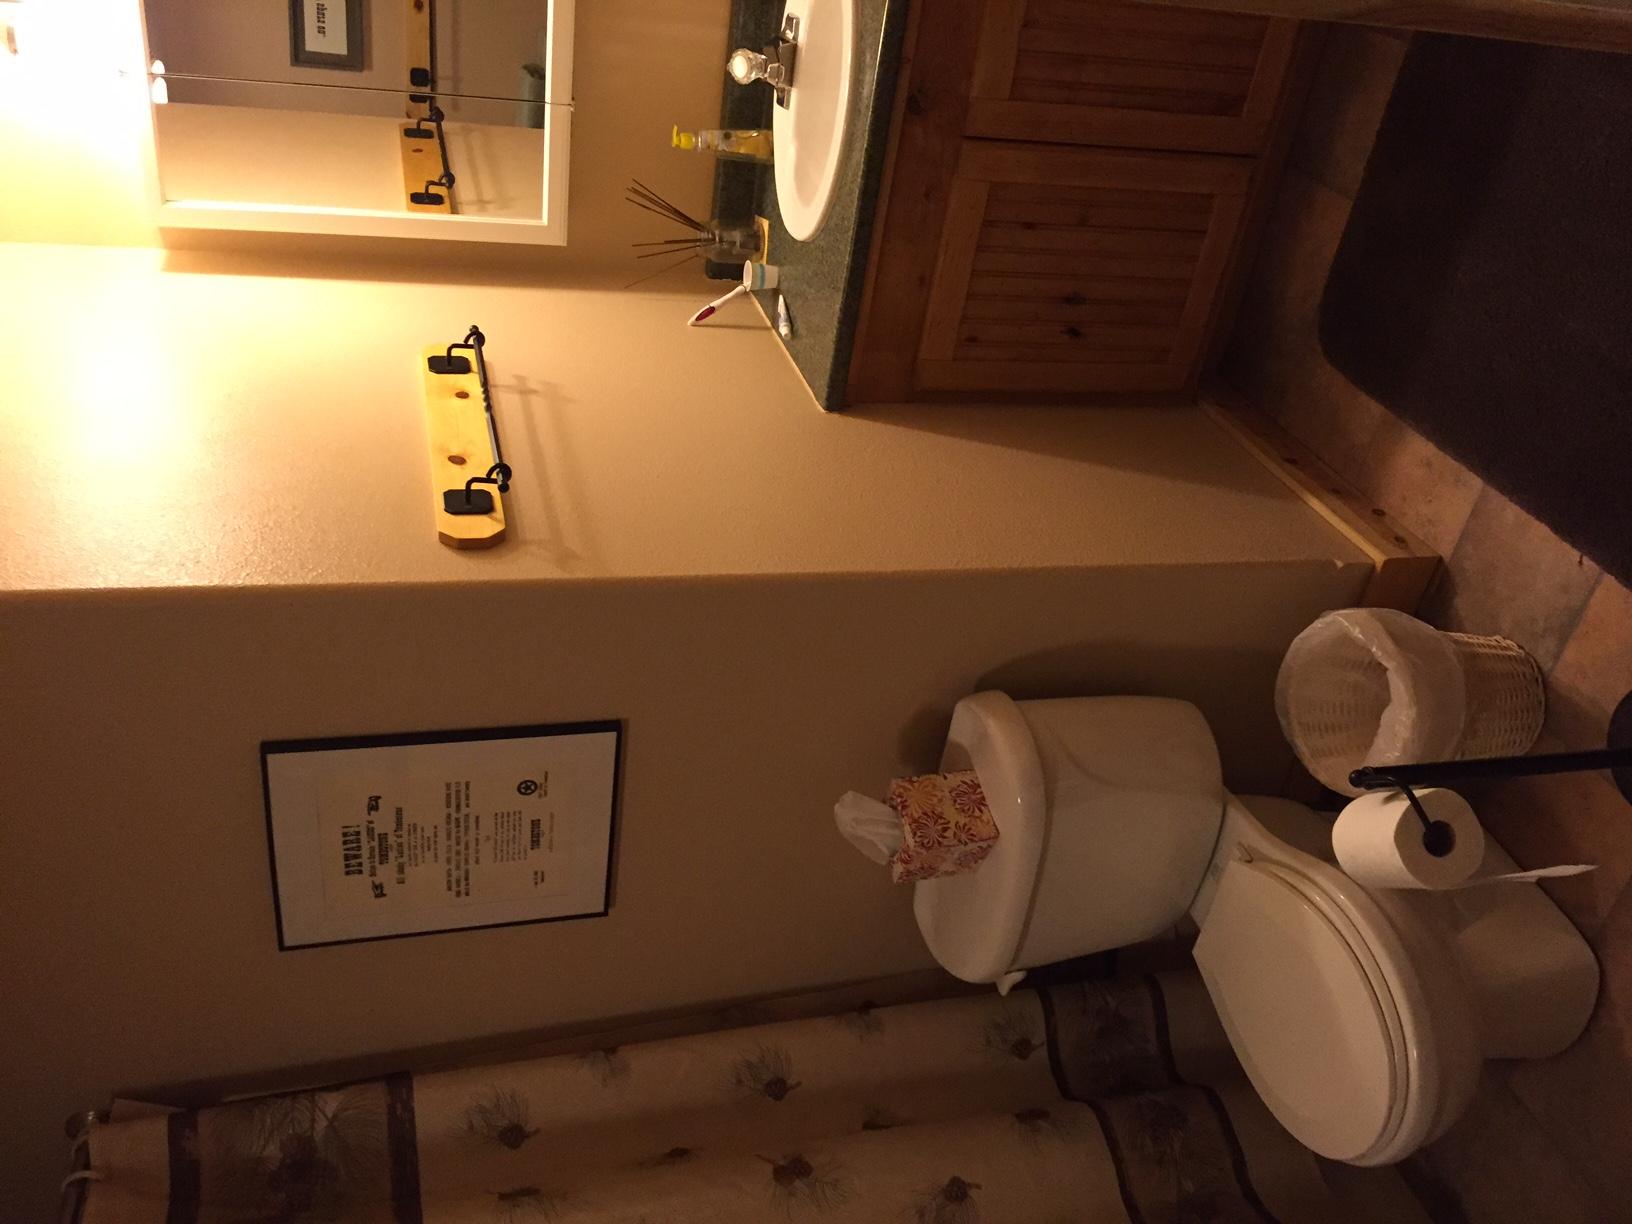 Mesquite Bathroom